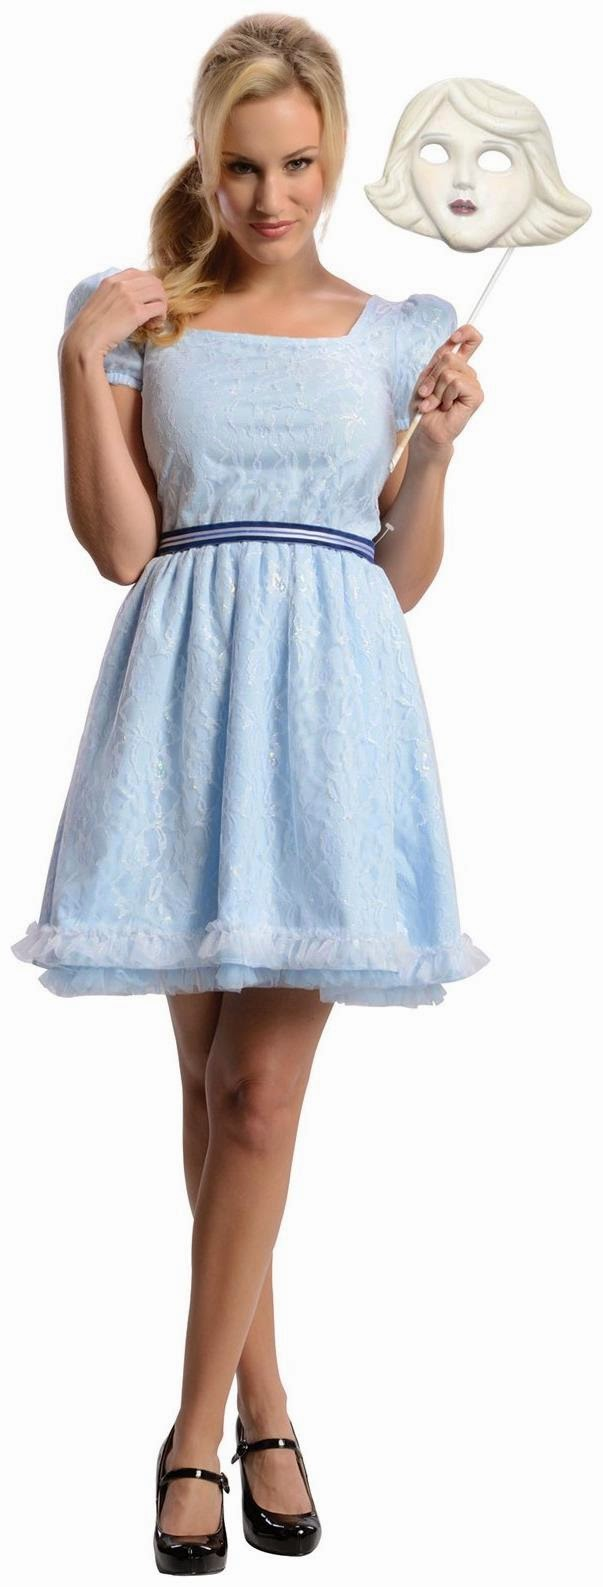 Sexy Costume Ideas 2014: Wizard of Oz Fancy Dress Costumes